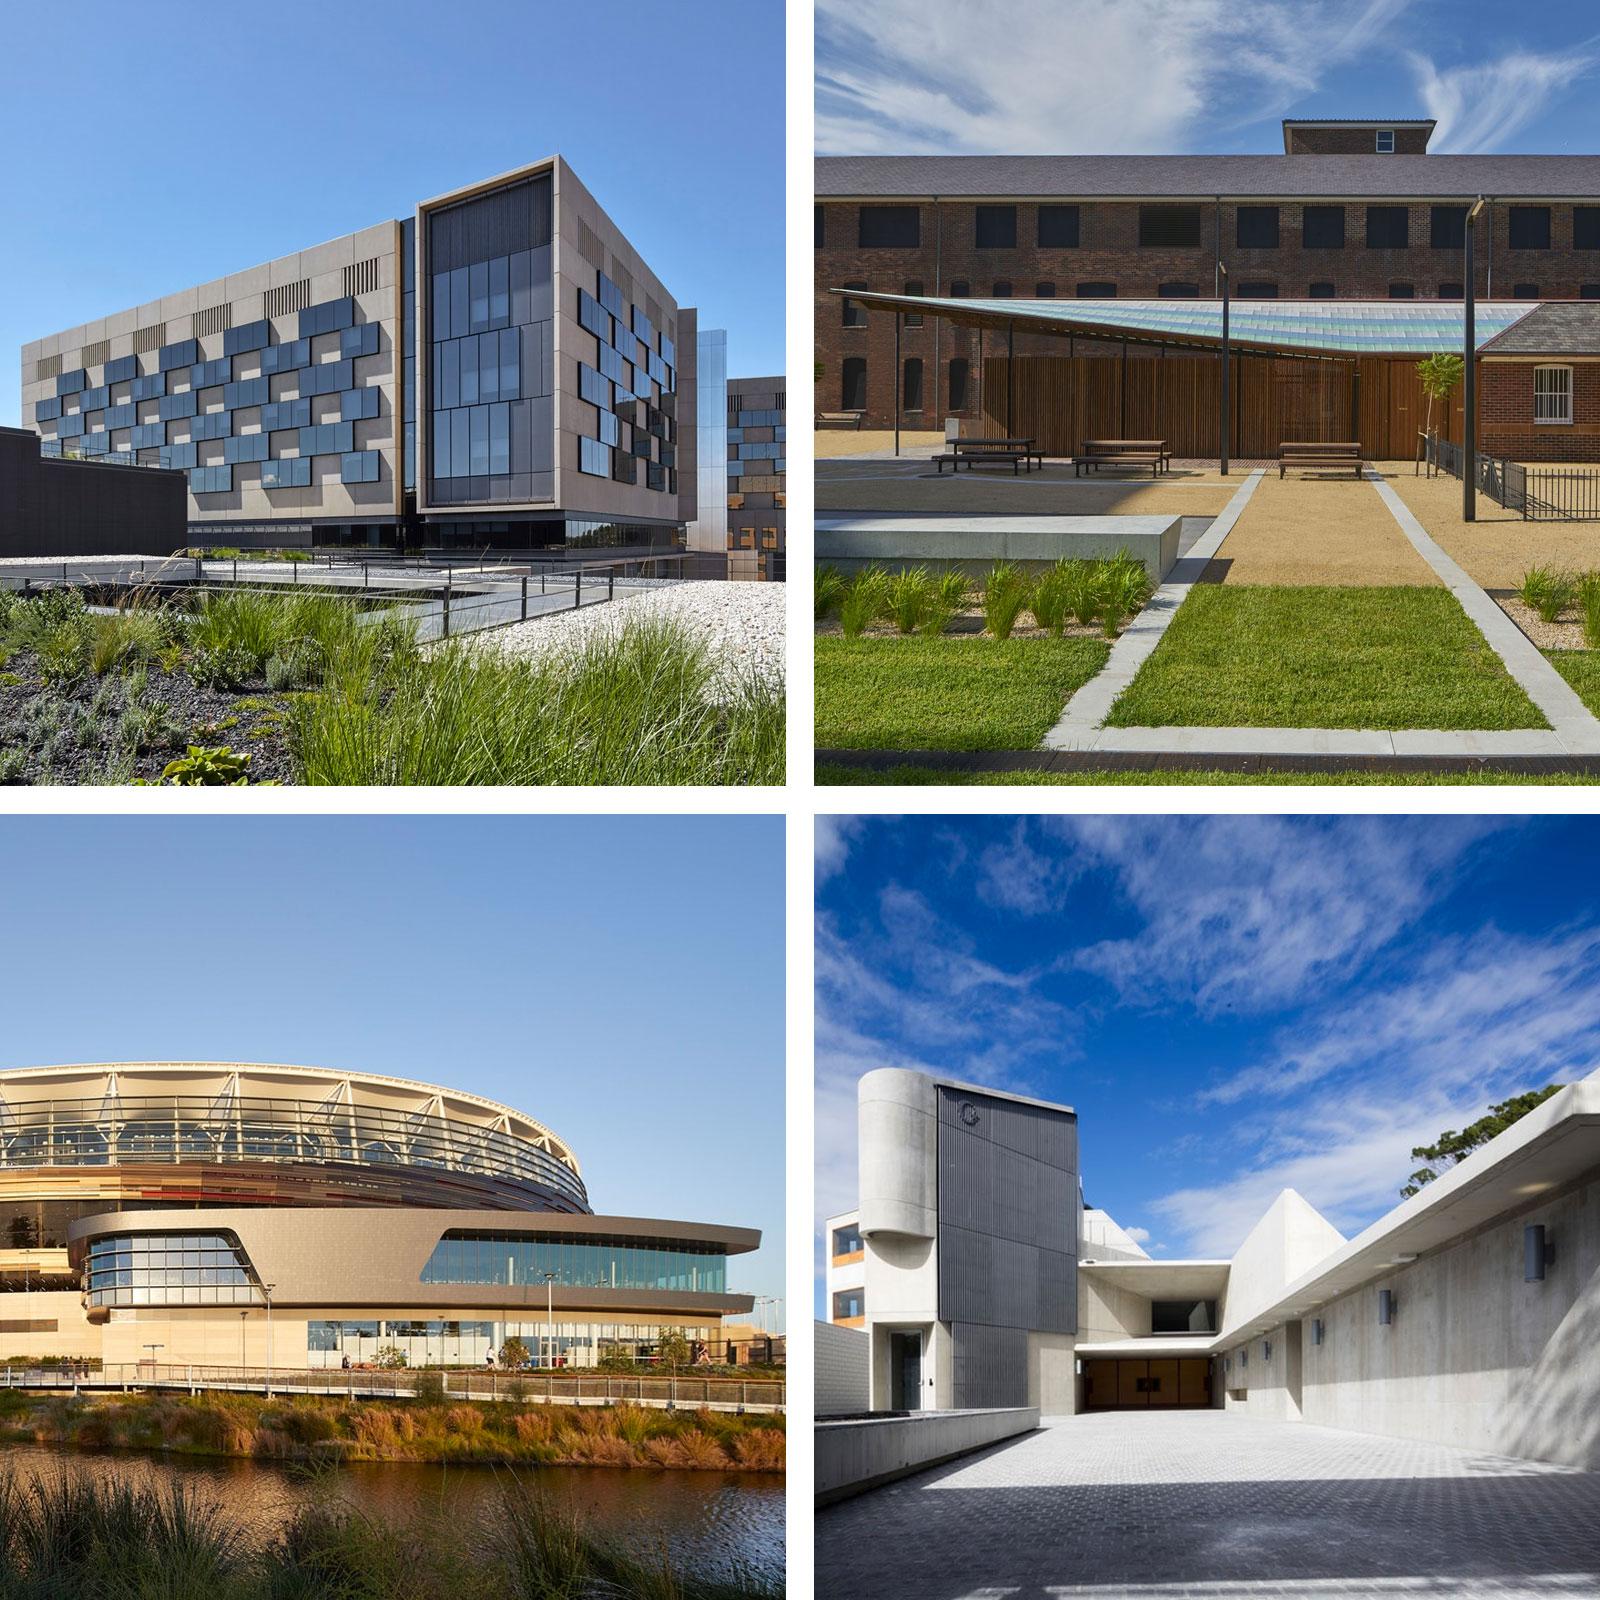 National Architecture Awards - Public Winner